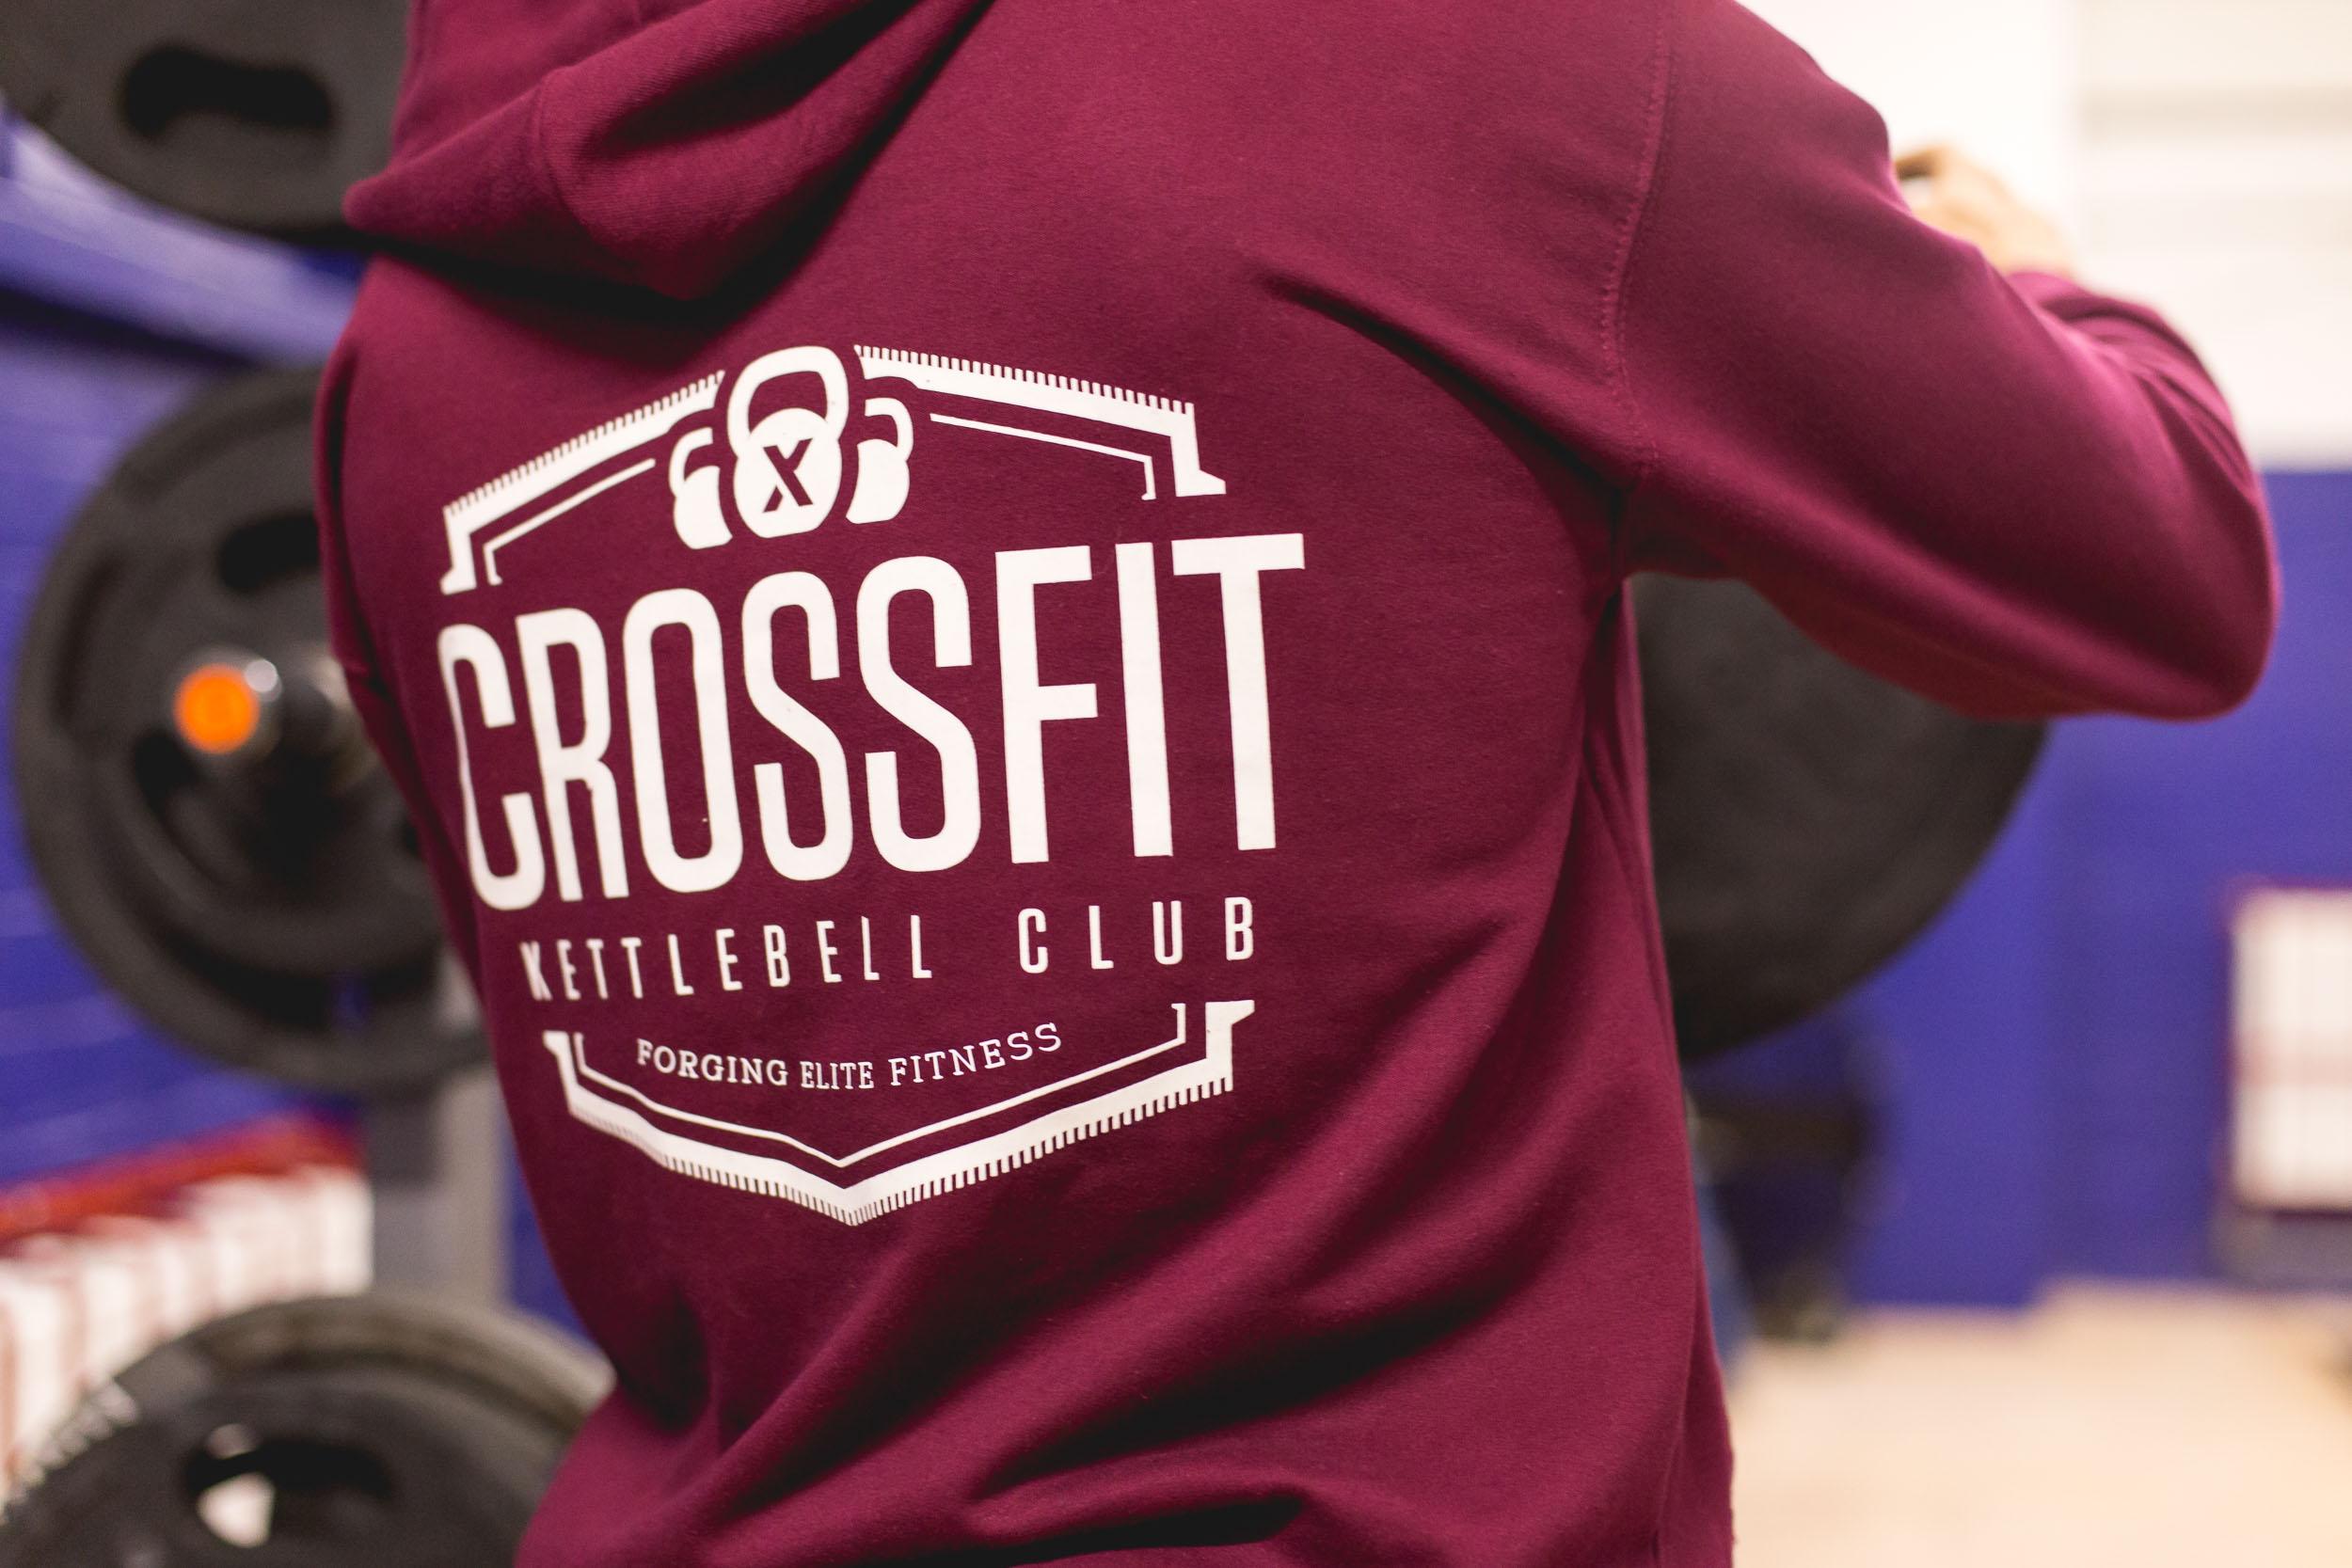 Crossfit UK printed clothing t-shirts-9980.jpg